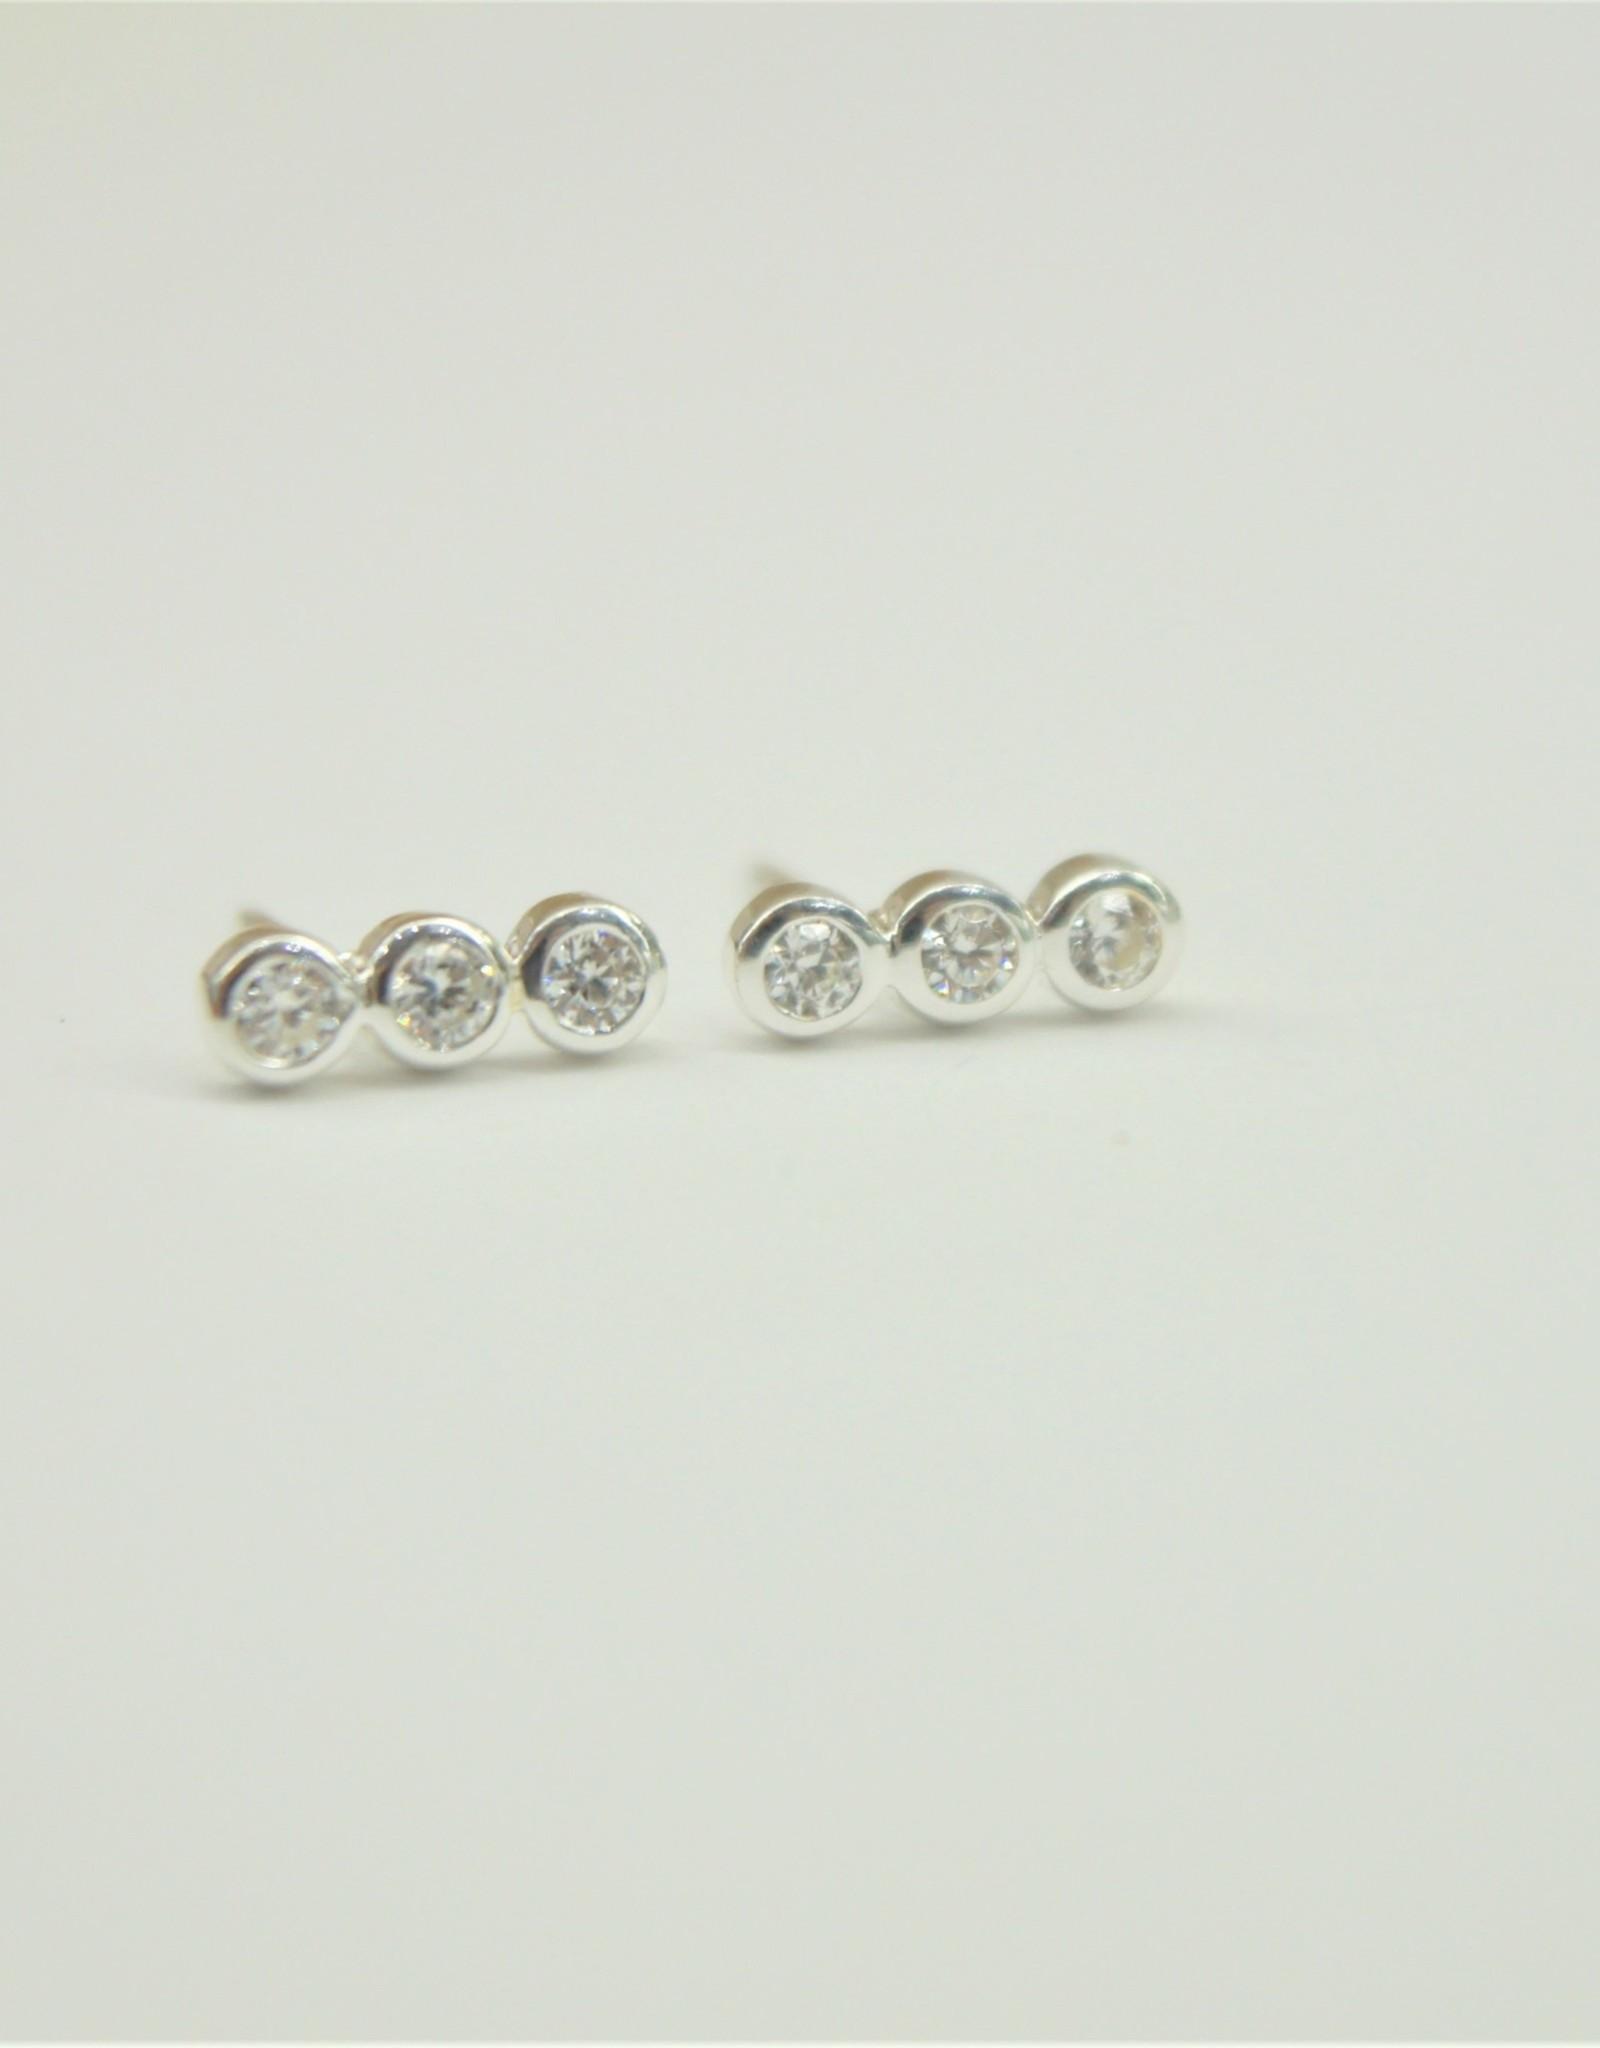 Tashi Row of Bezel Set Cubic Zirconia Earrings